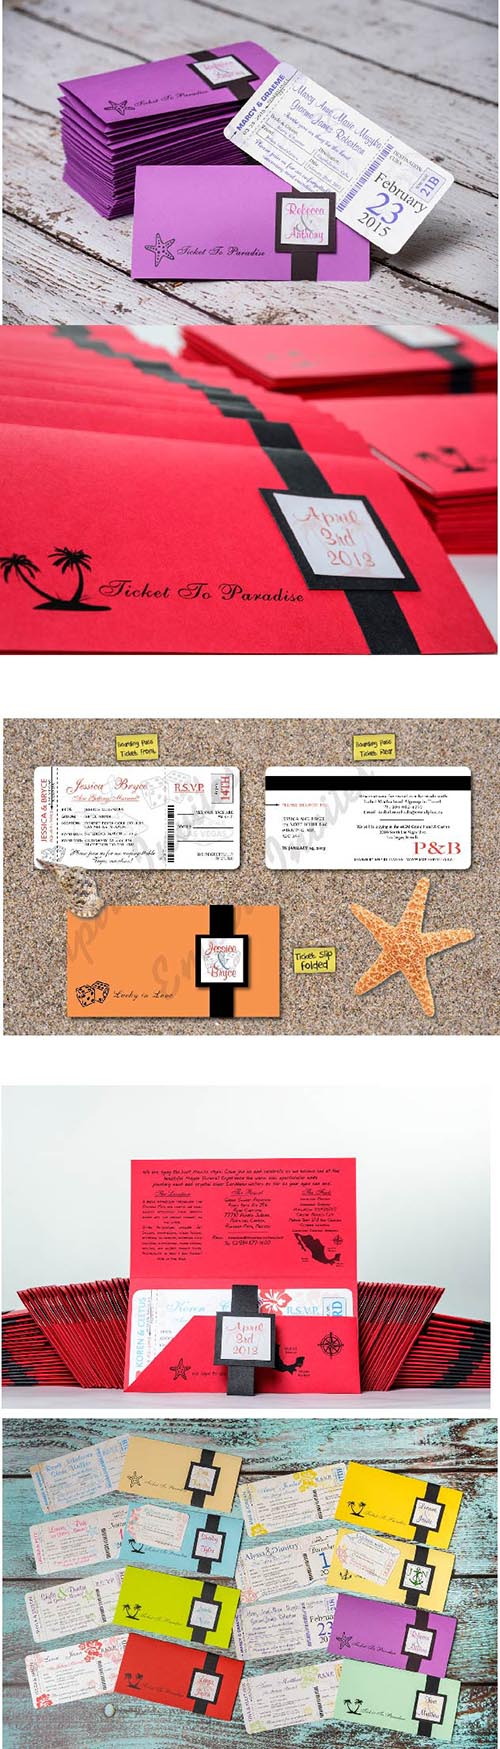 Custom Vegas themed boarding pass wedding invitations Canada ...